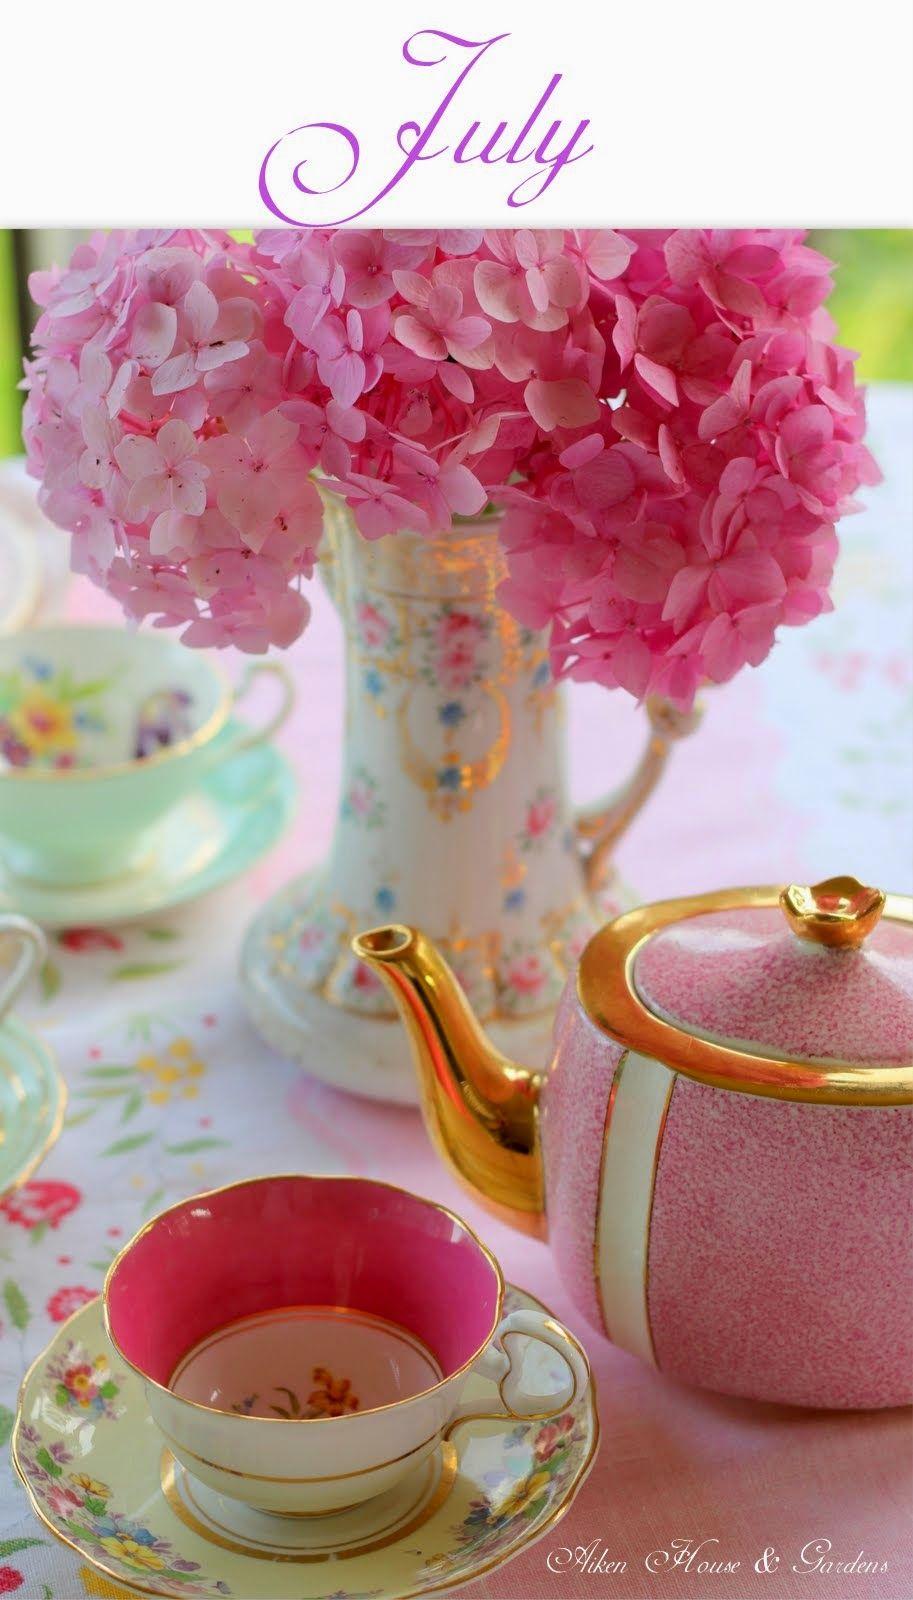 July tea